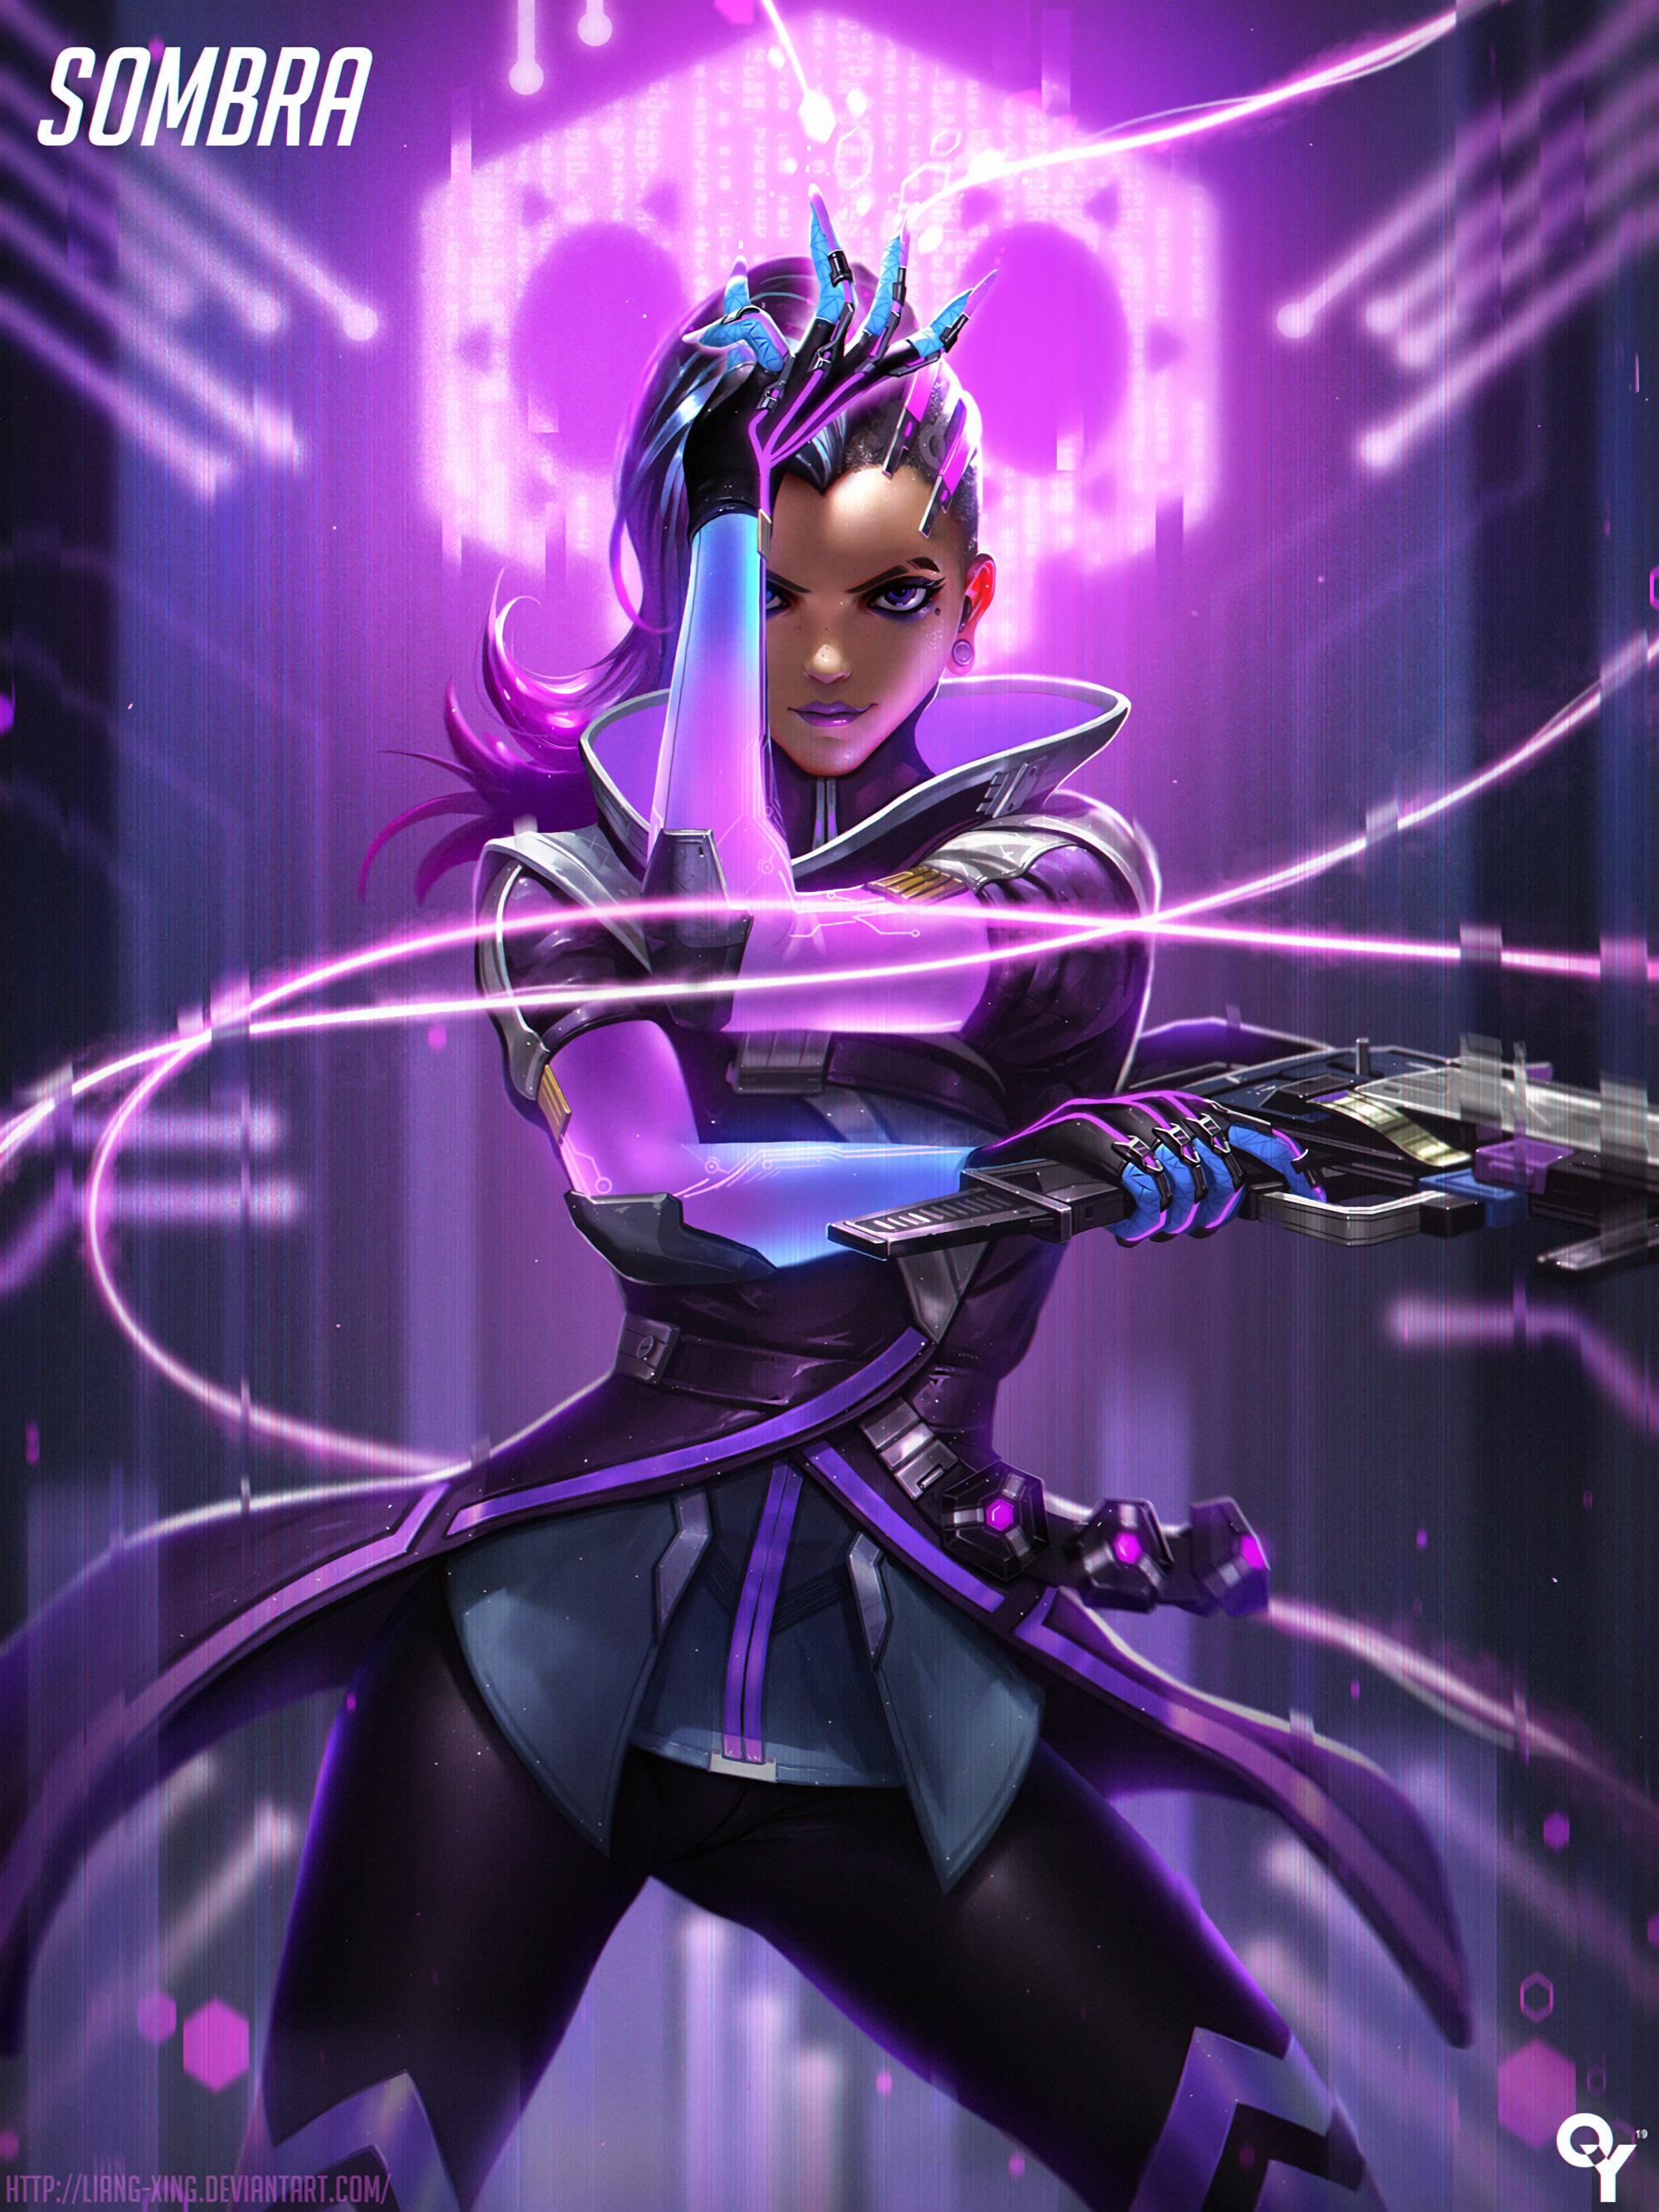 Anime 2000x2666 anime anime girls Overwatch Sombra (Overwatch) Sombra long hair purple hair purple eyes weapon gun